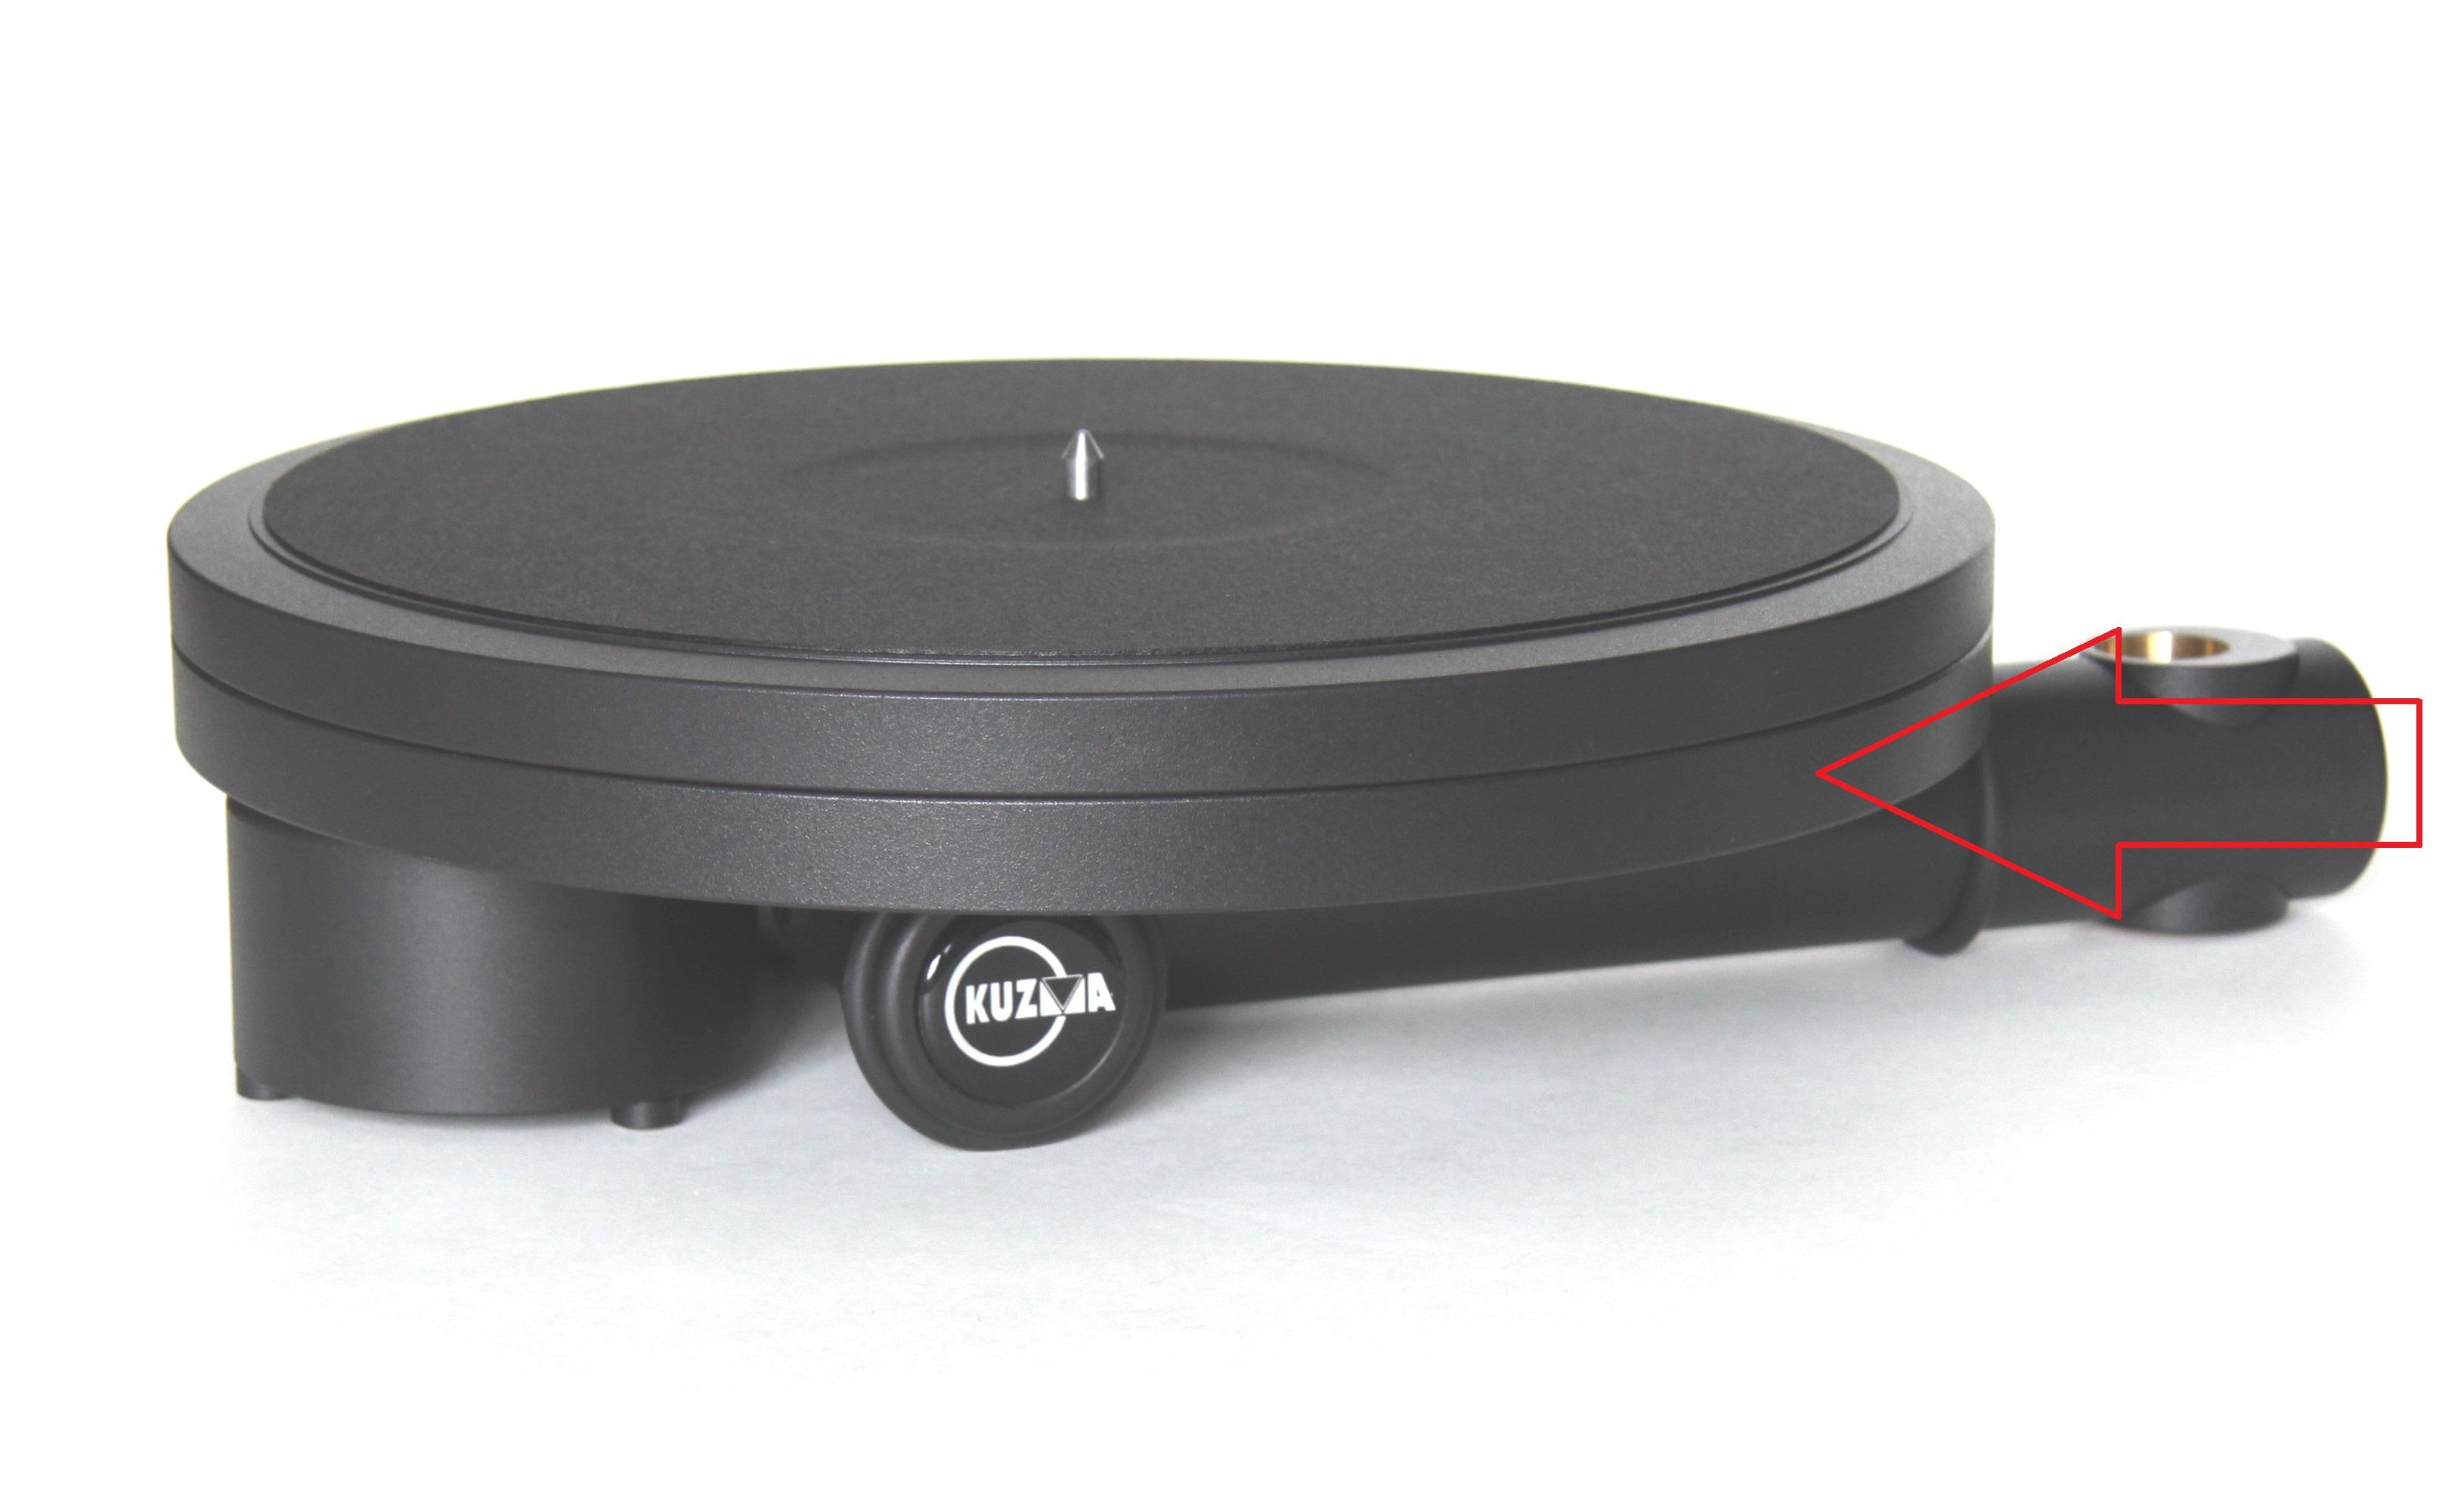 Stabi S Kuzma Professional Turntables Tonearms And